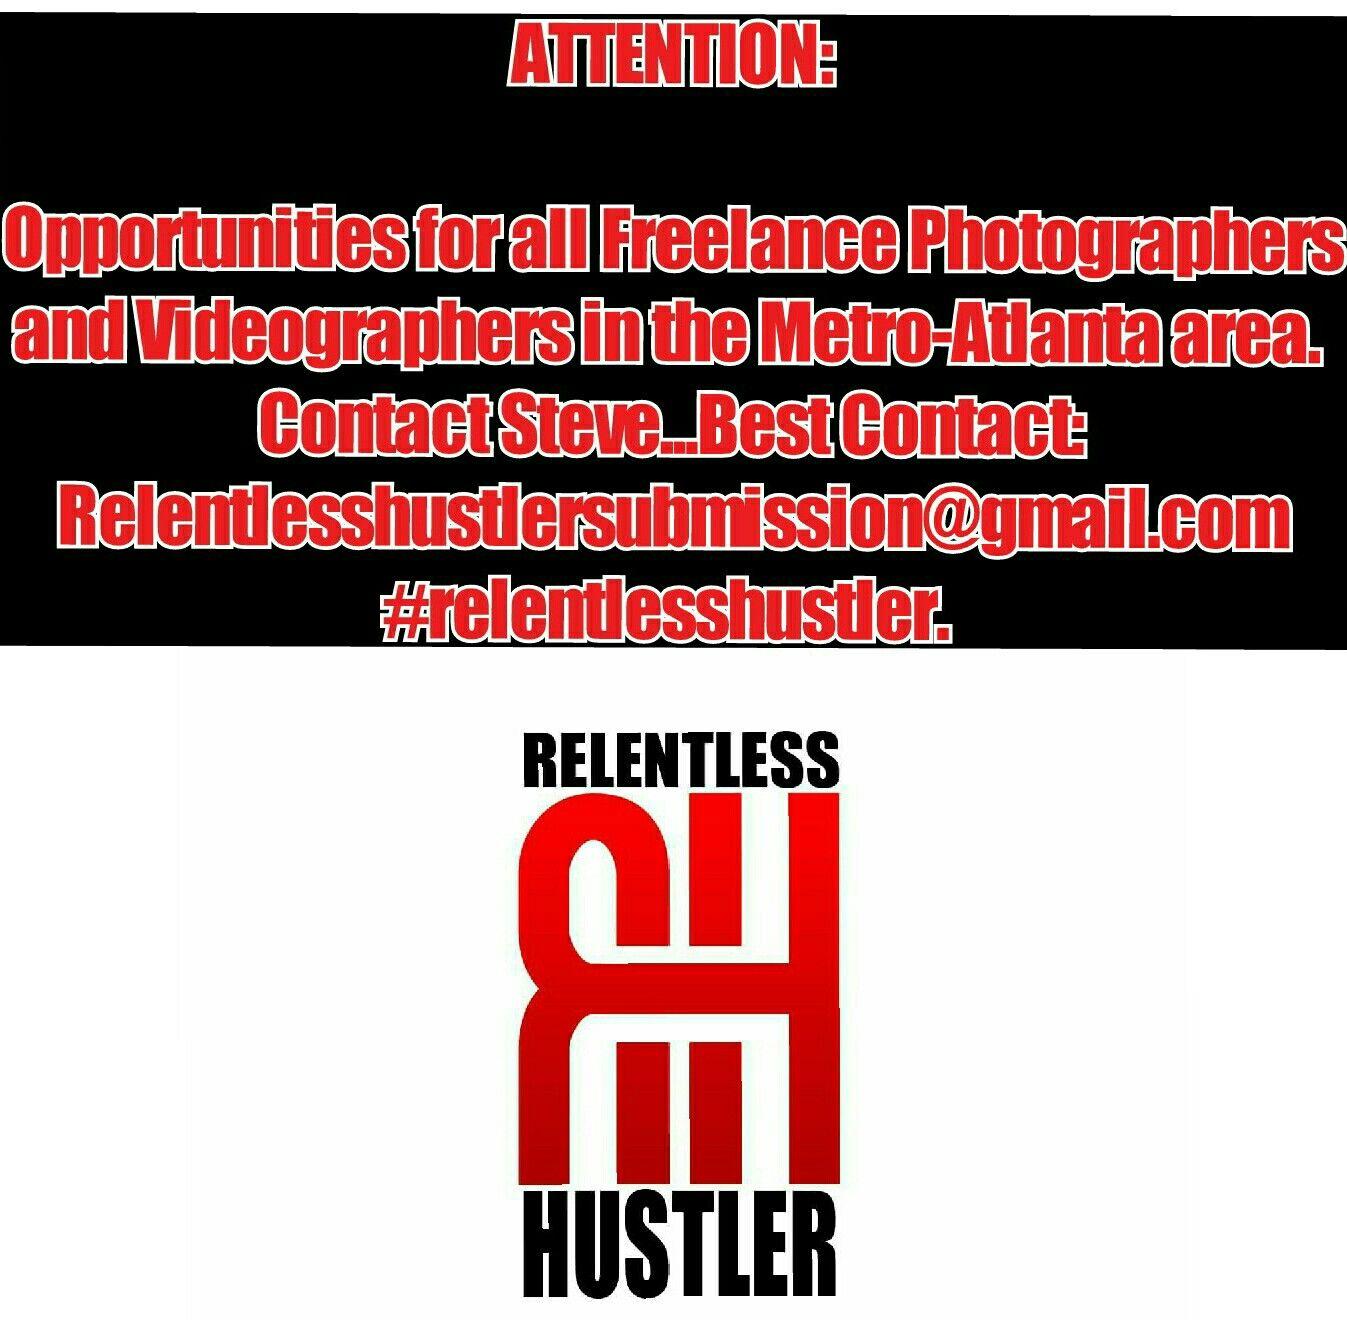 Contact Steve at Relentlesshustlersubmission@gmail.com